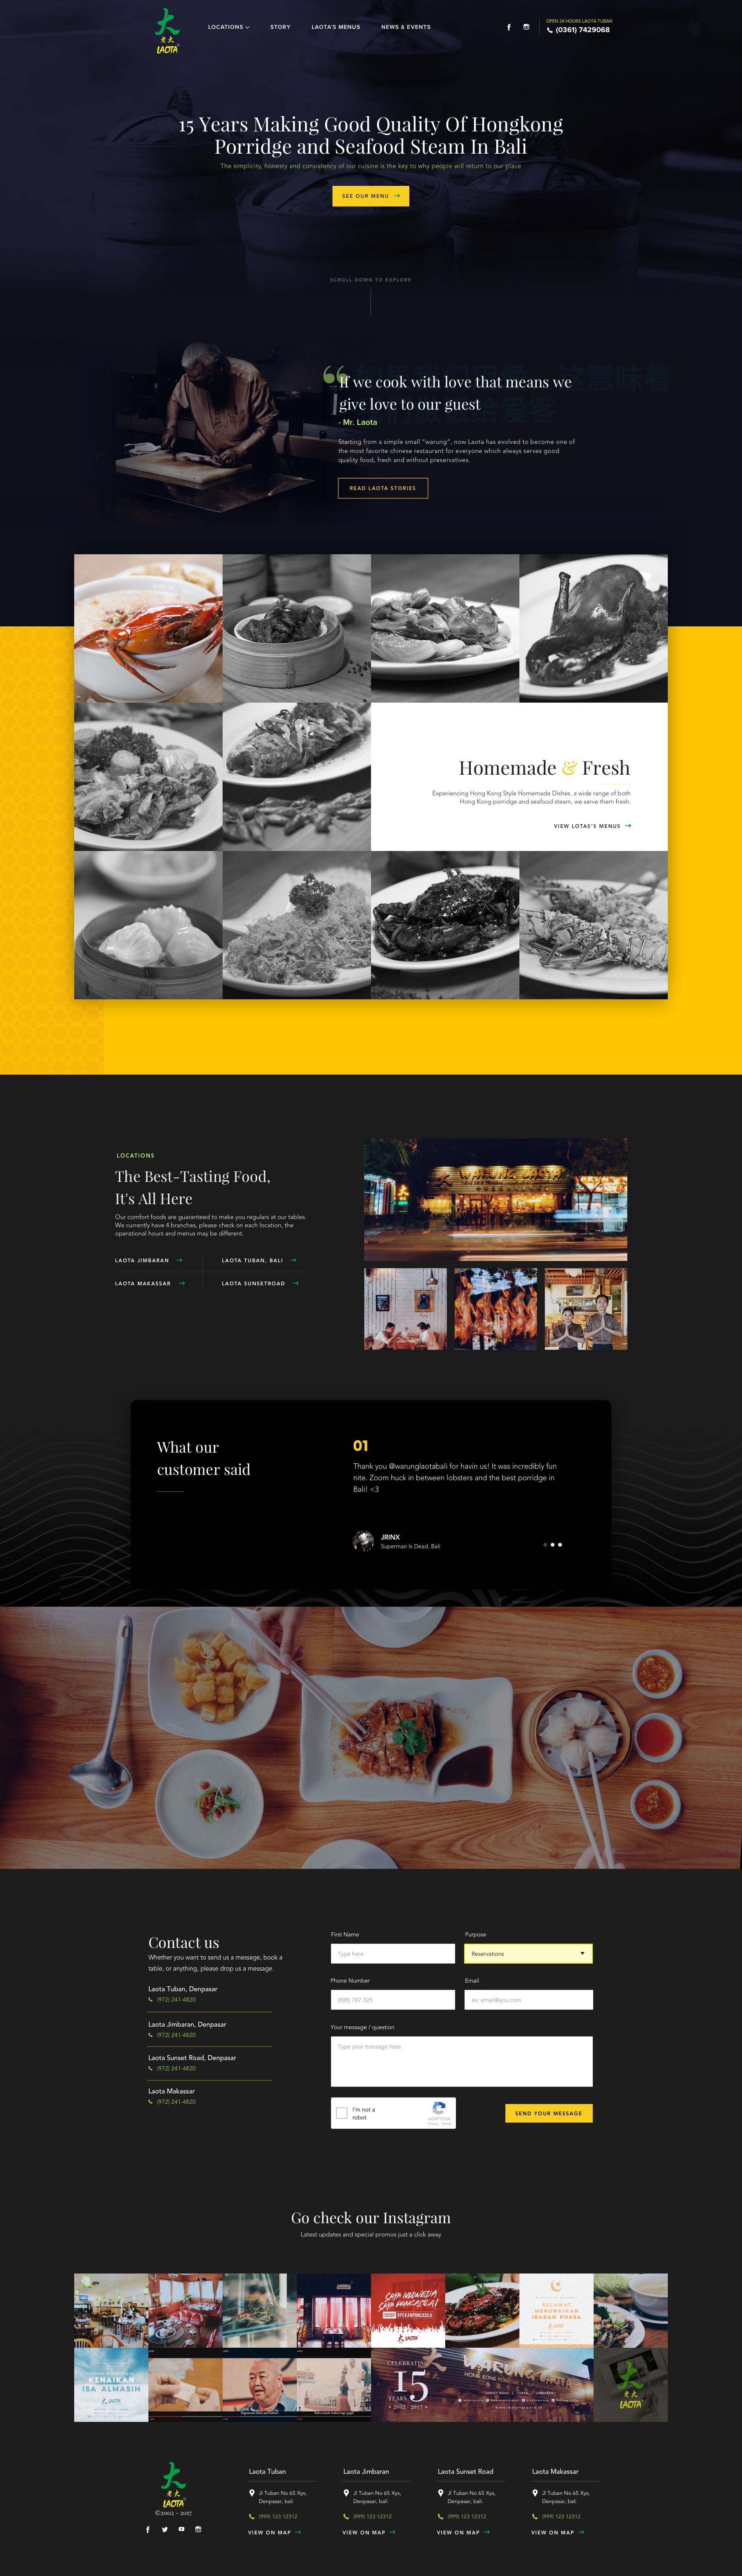 Warung laota homepage caldhela